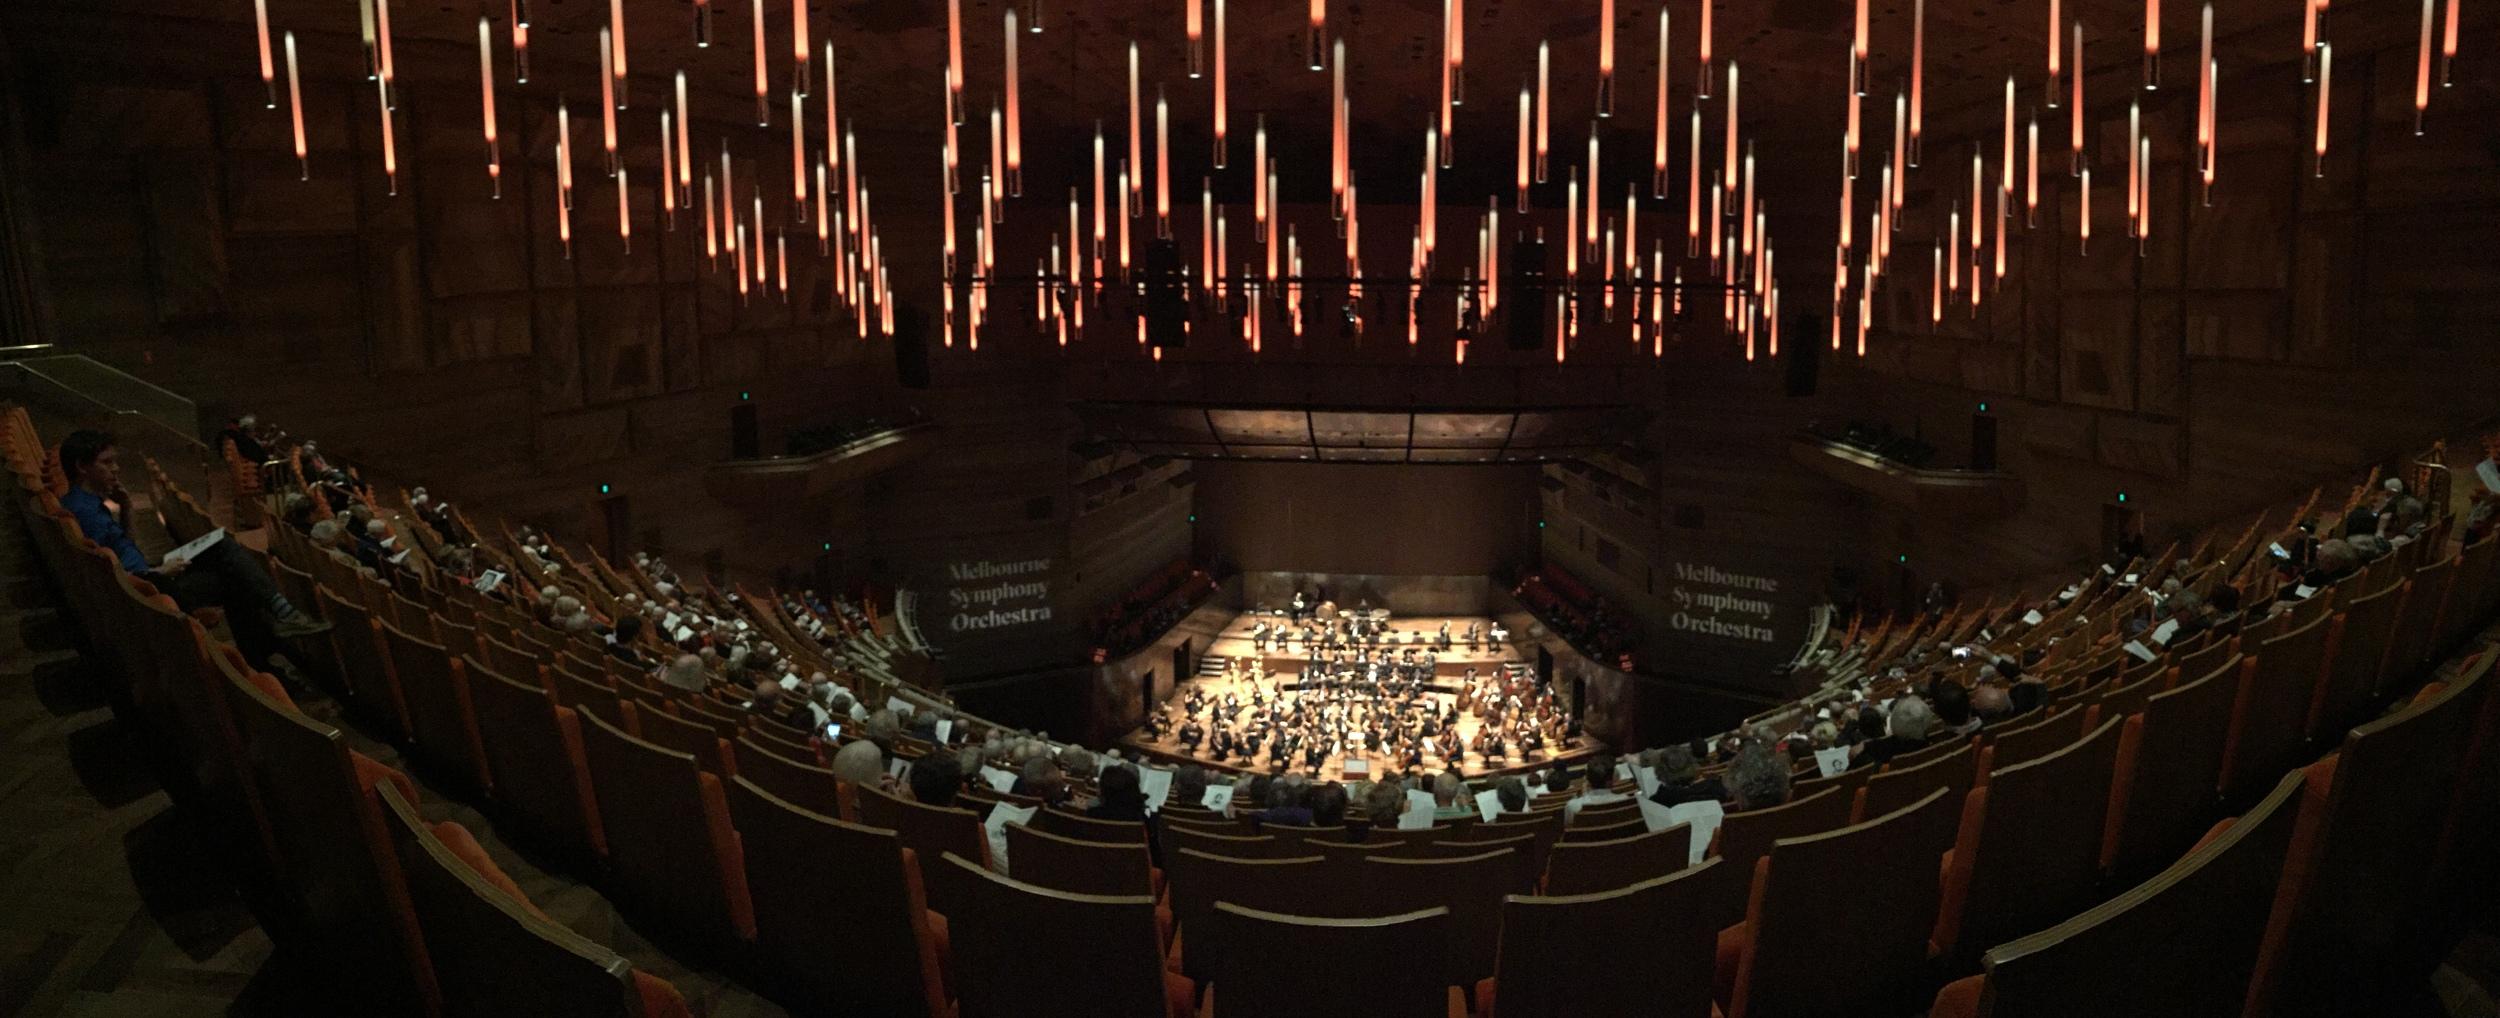 The Melbourne Symphony Orchestra at Hamer Hall, pre-performance of  Mendelssohn's Italian Symphony . Image: © Jasen Scott, 2016.